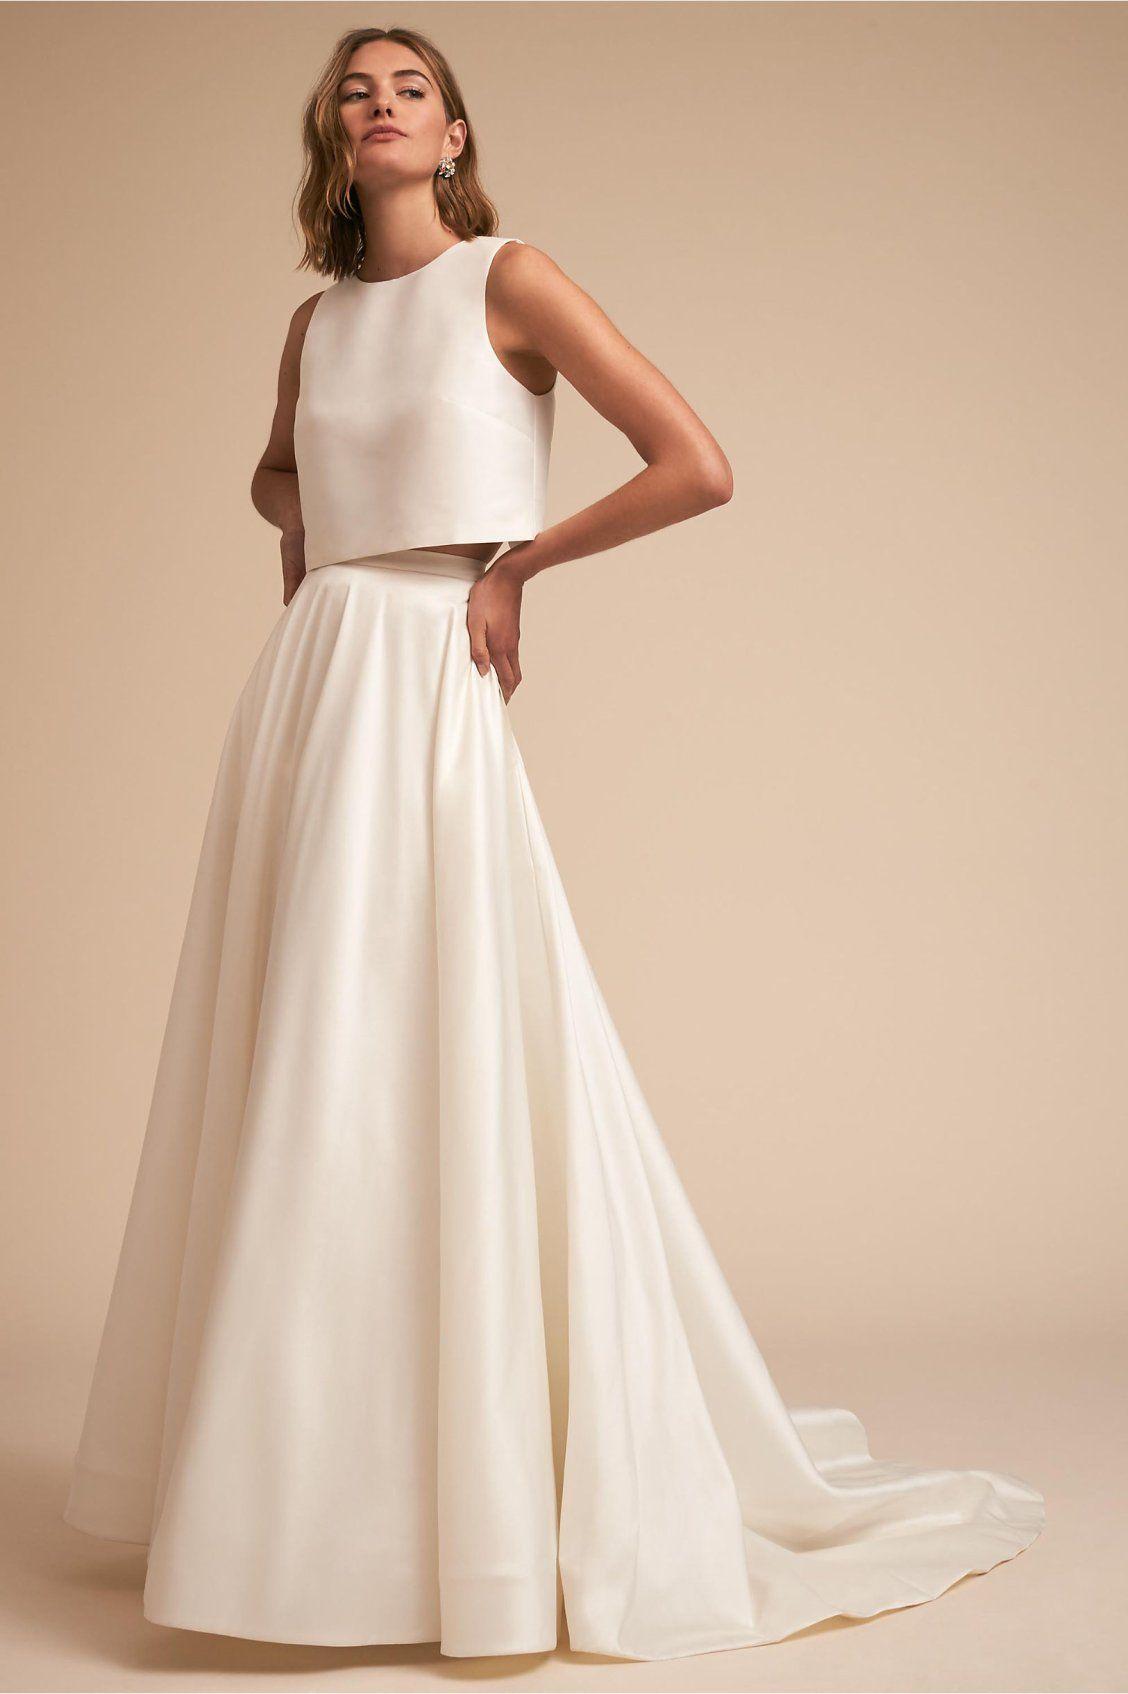 10+ Build your own wedding dress ideas ideas